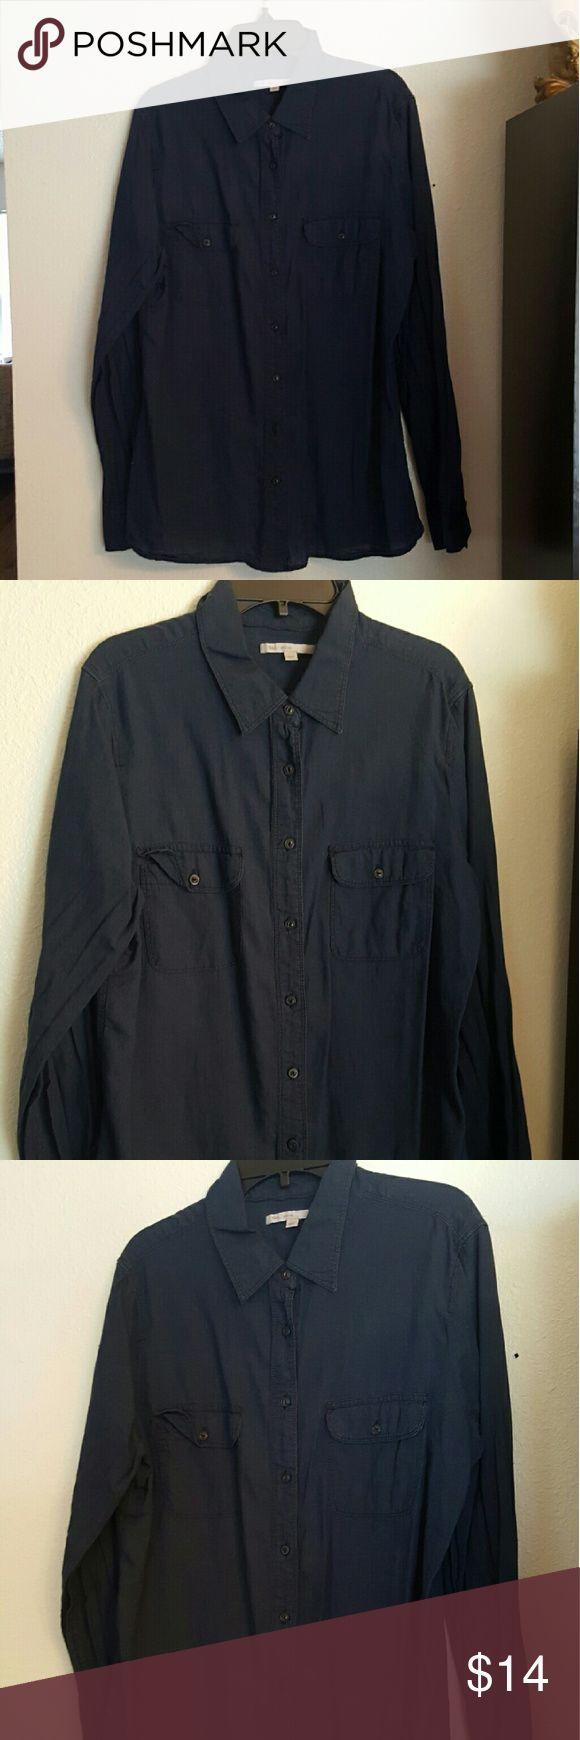 *LIKE NEW* GAP Women's Button-Down Sz Medium *LIKE NEW CONDITION*  GAP Women's Button-Down Navy Blue   Women's  Size  Medium GAP Tops Button Down Shirts